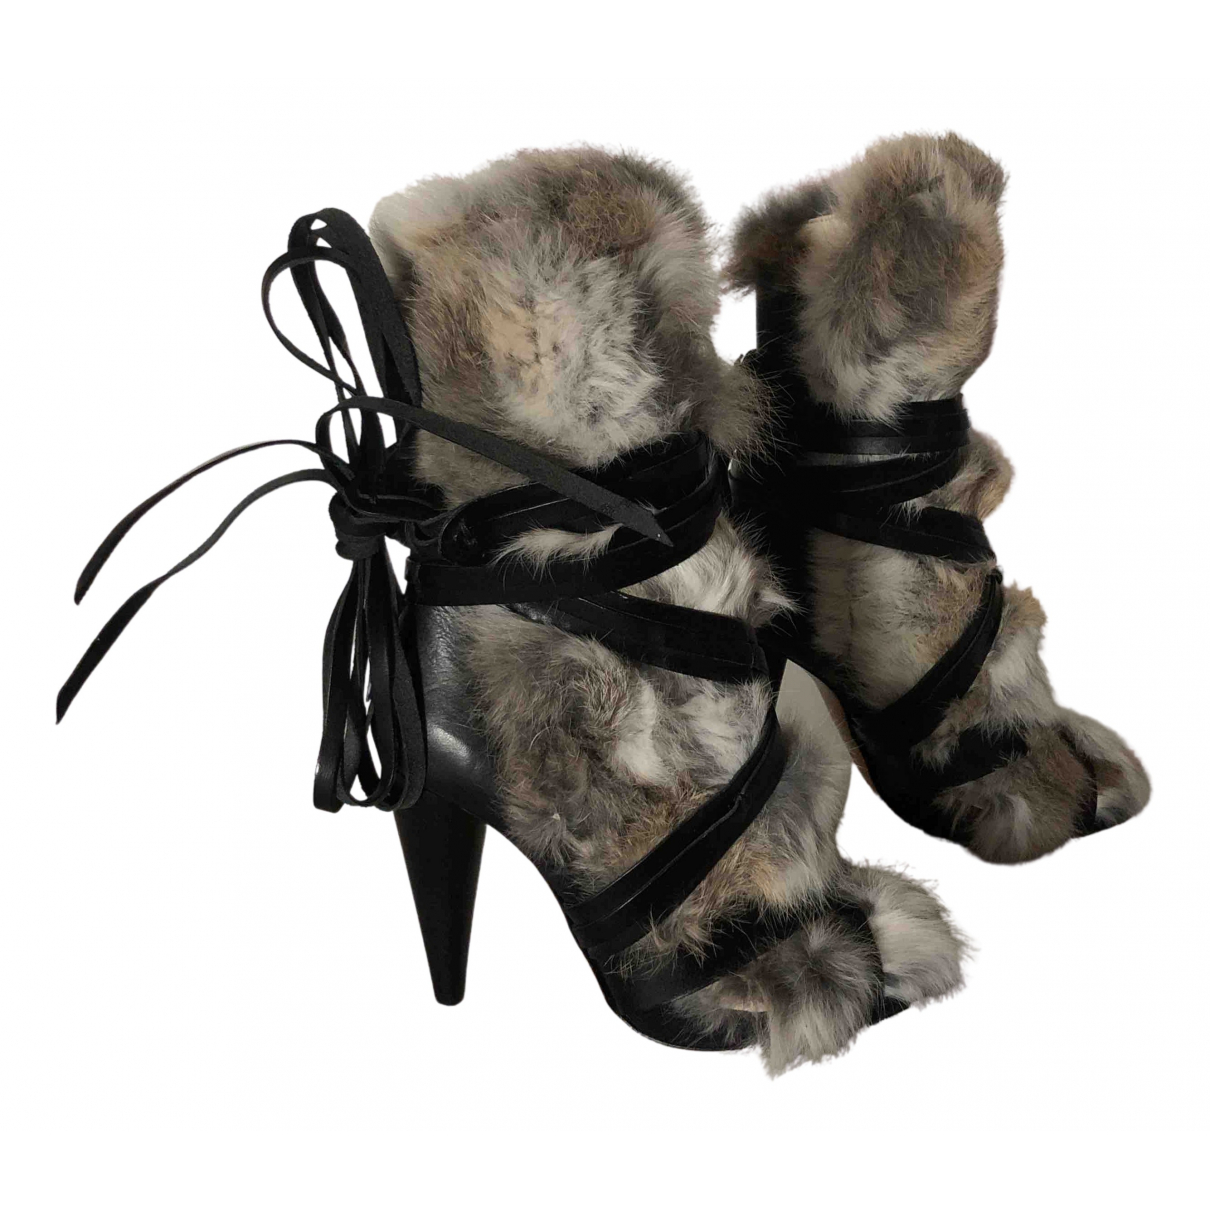 Isabel Marant N Multicolour Rabbit Ankle boots for Women 37 EU